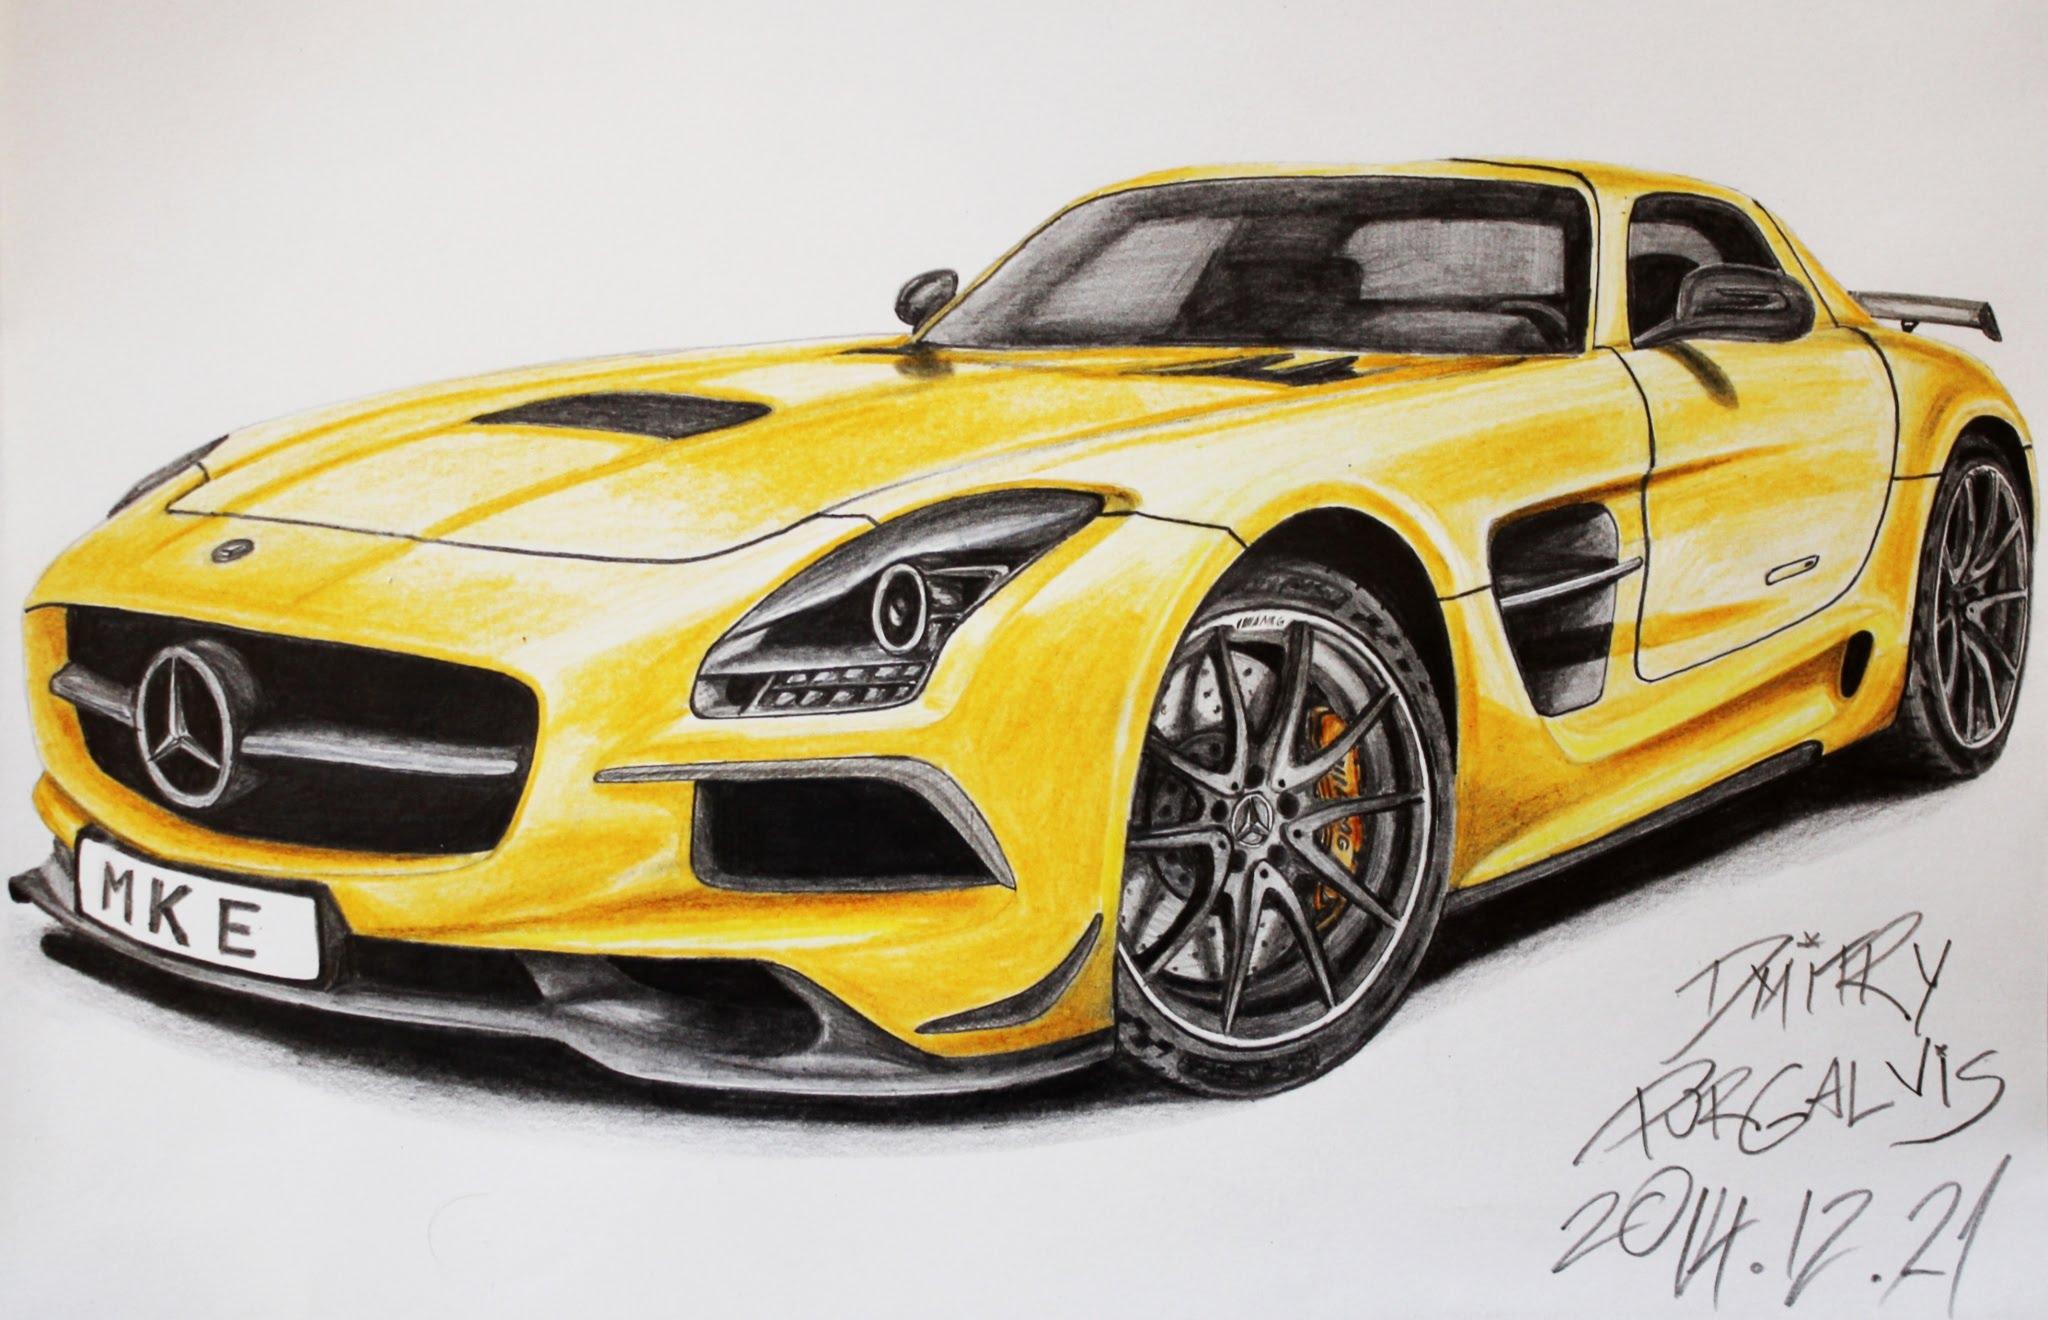 2048x1320 2014 Mercedes Benz Sls Amg Black Series Drawing